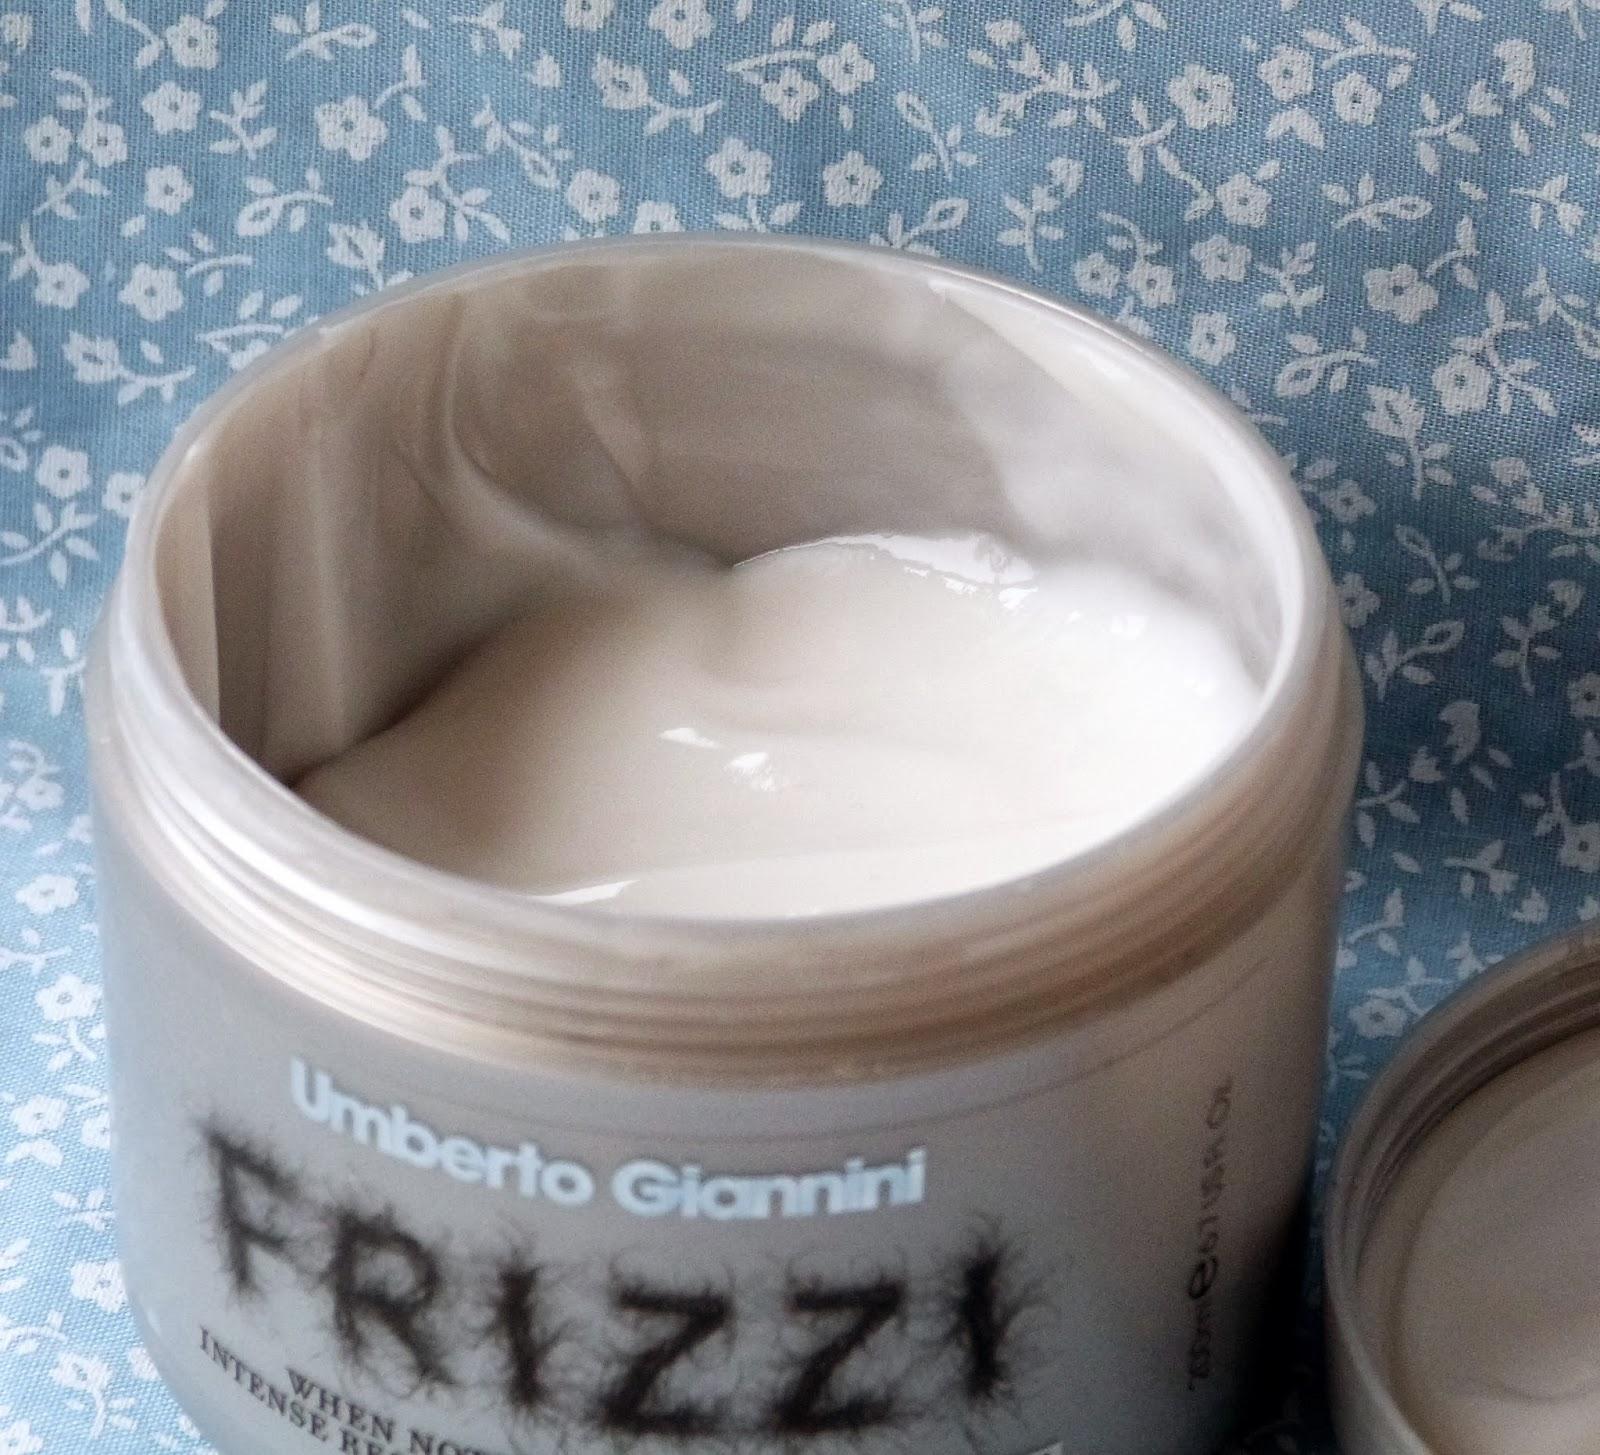 Umberto Giannini Frizzi Recovery Mask